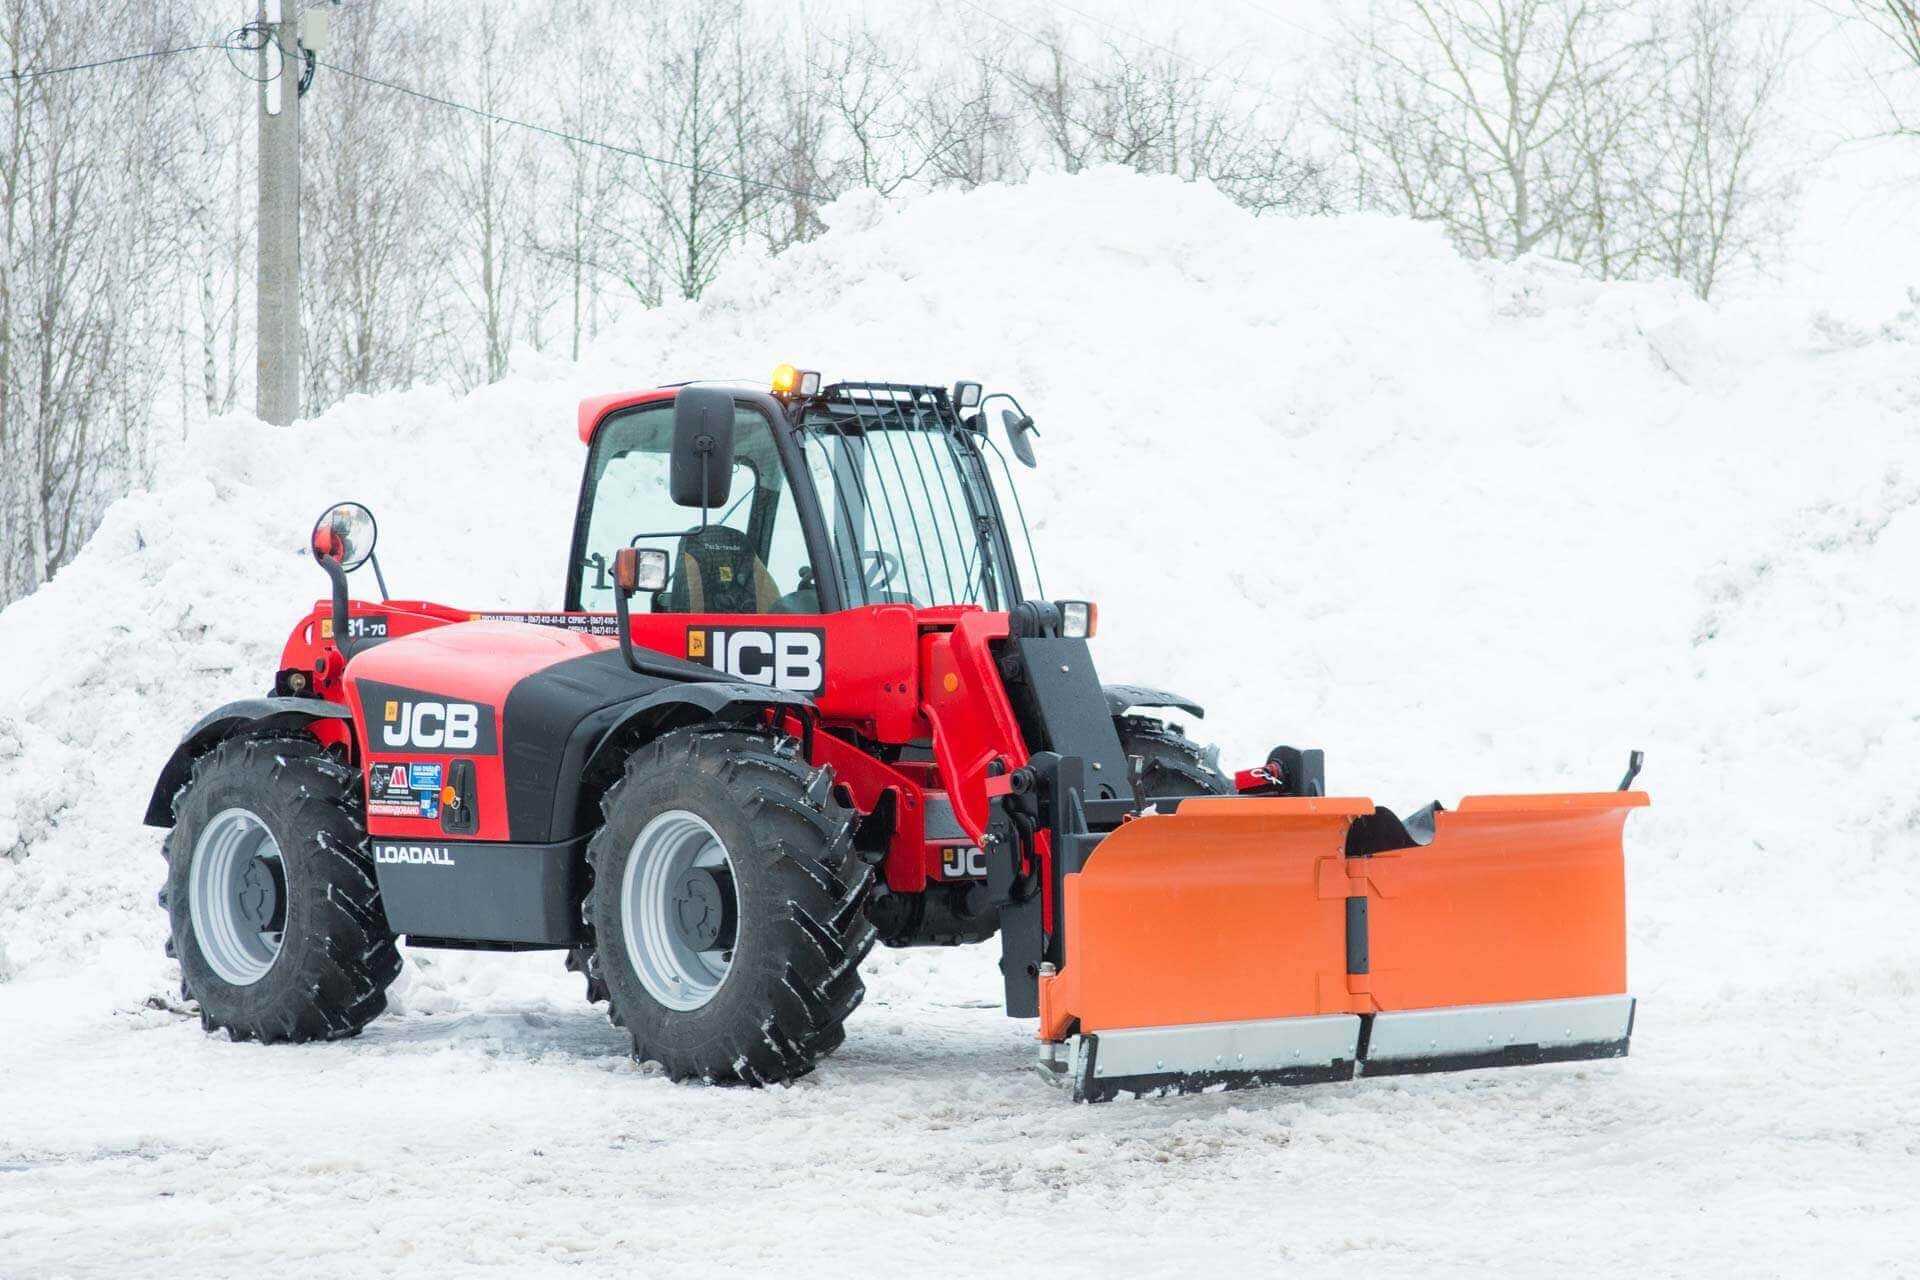 Отвал для снега на JCB 531-70